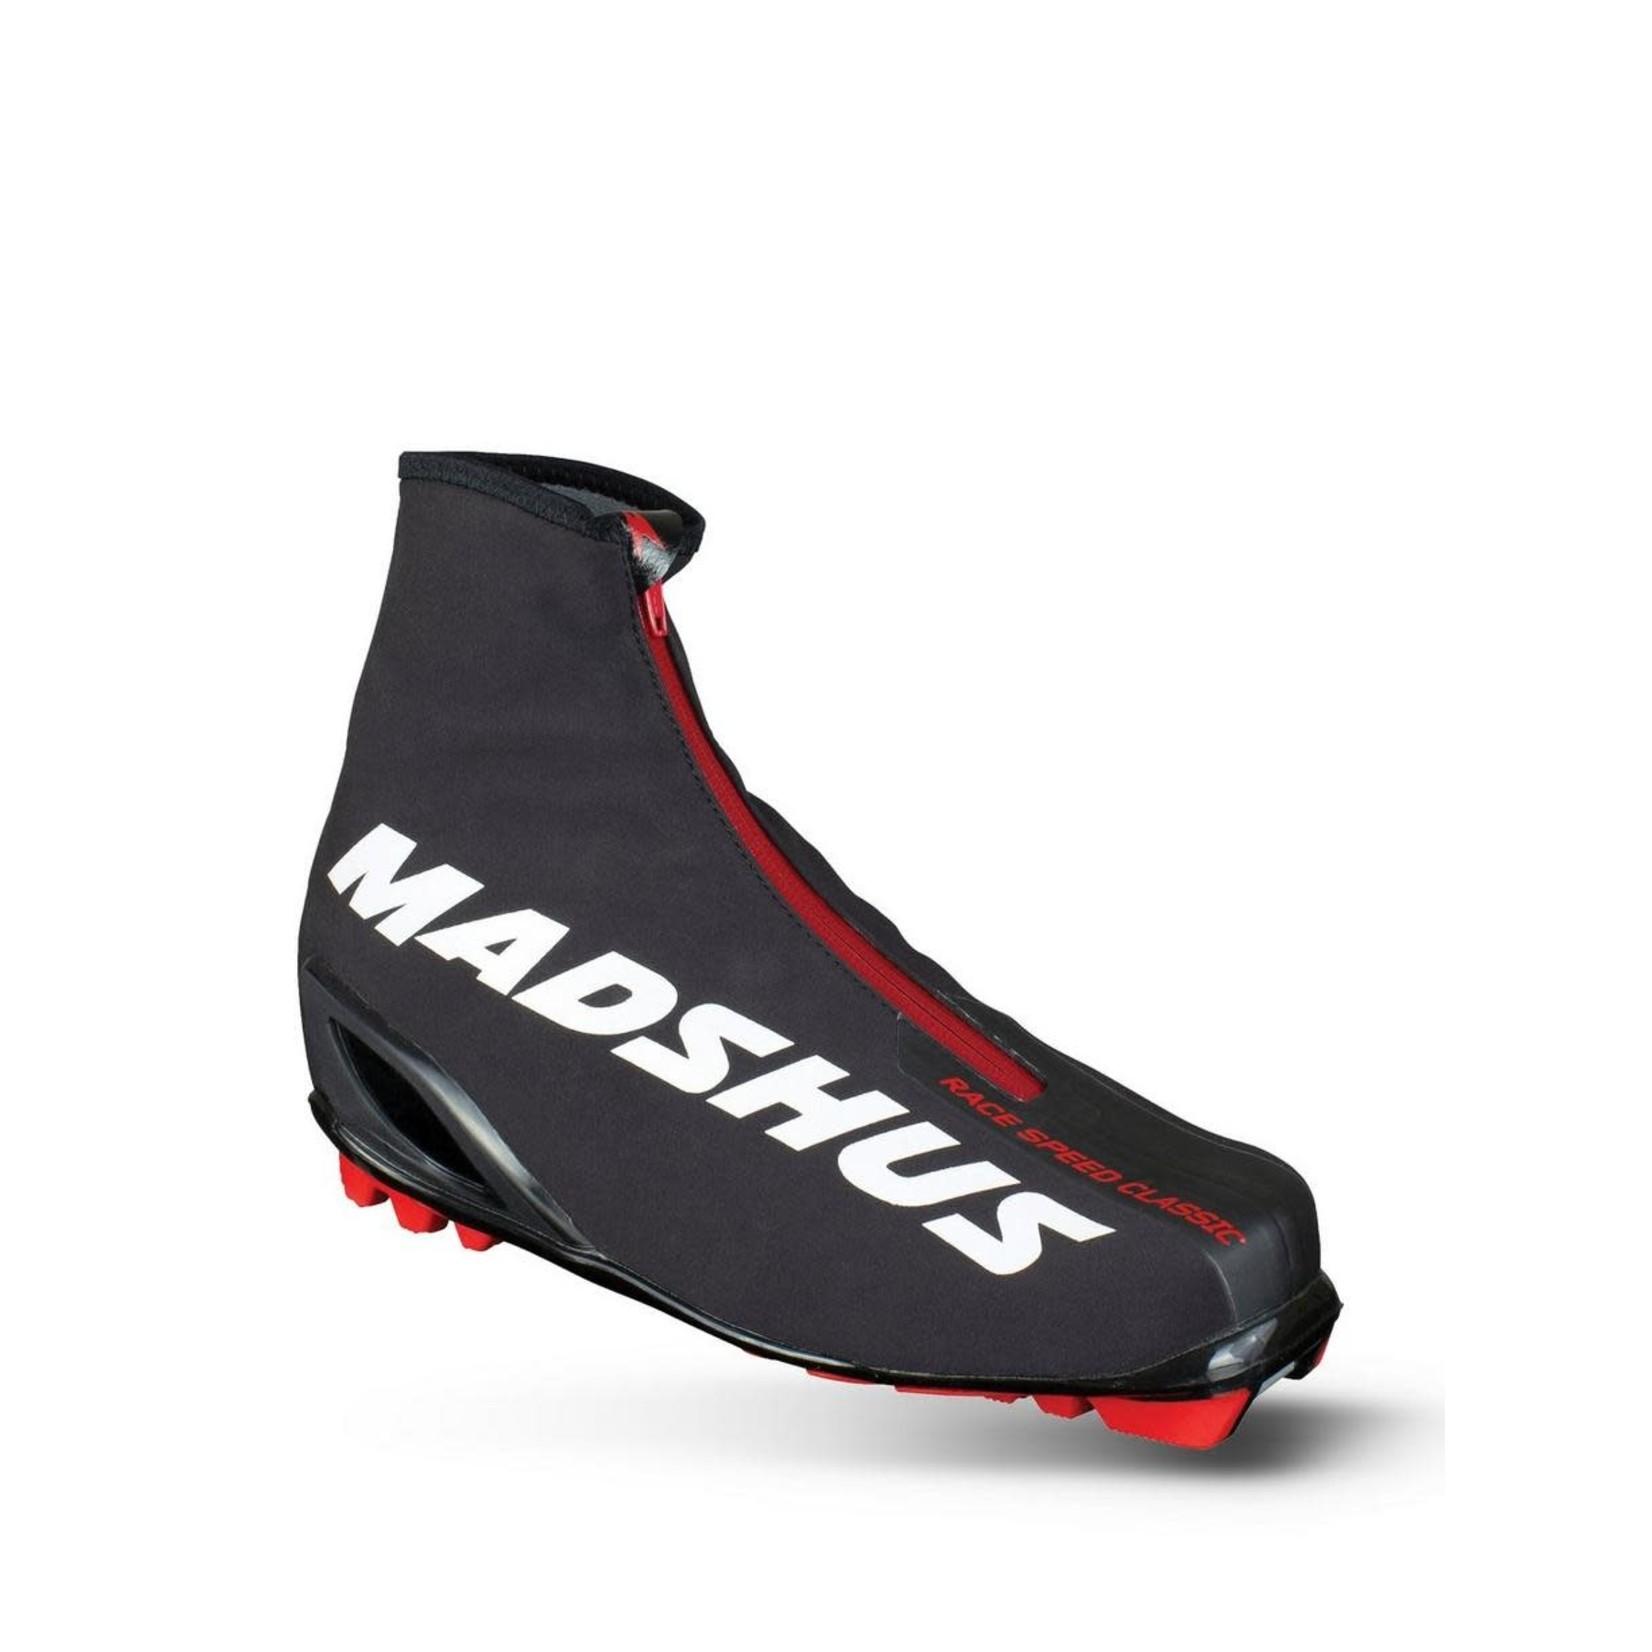 Madshus Madshus Race Speed Classic Boot